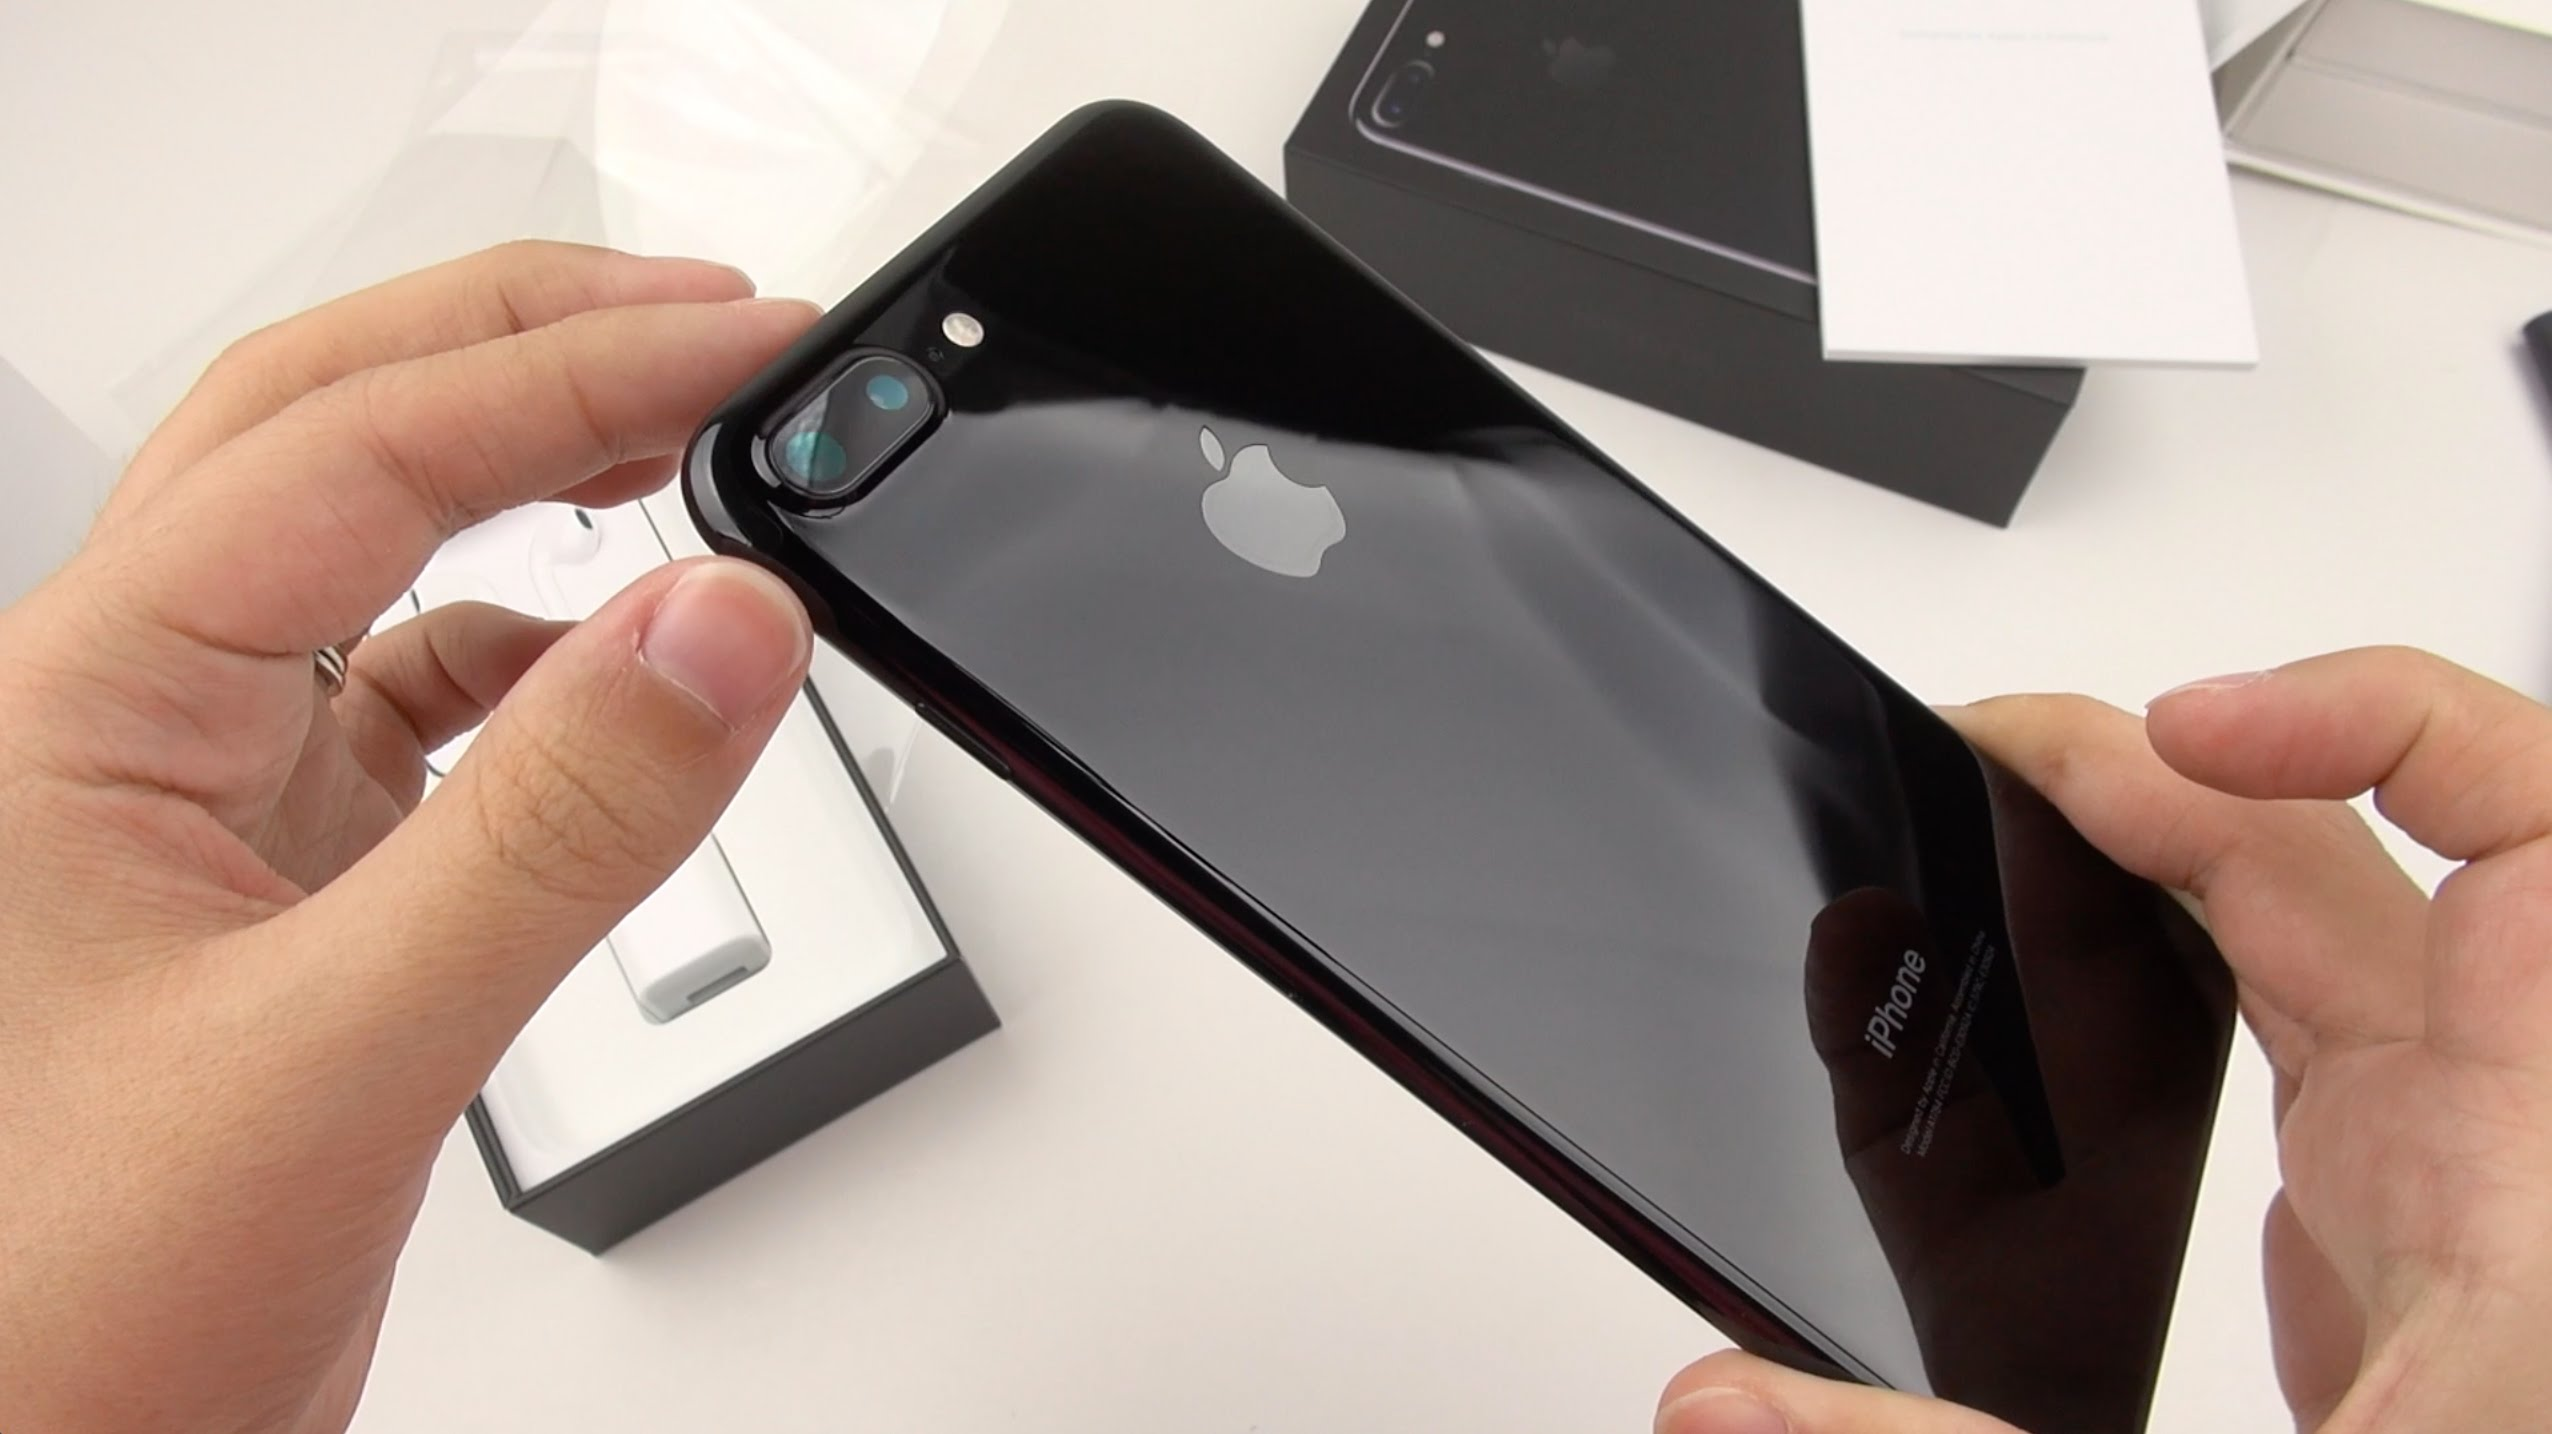 Как включить режим модема на iPhone 6 и iPhone 7